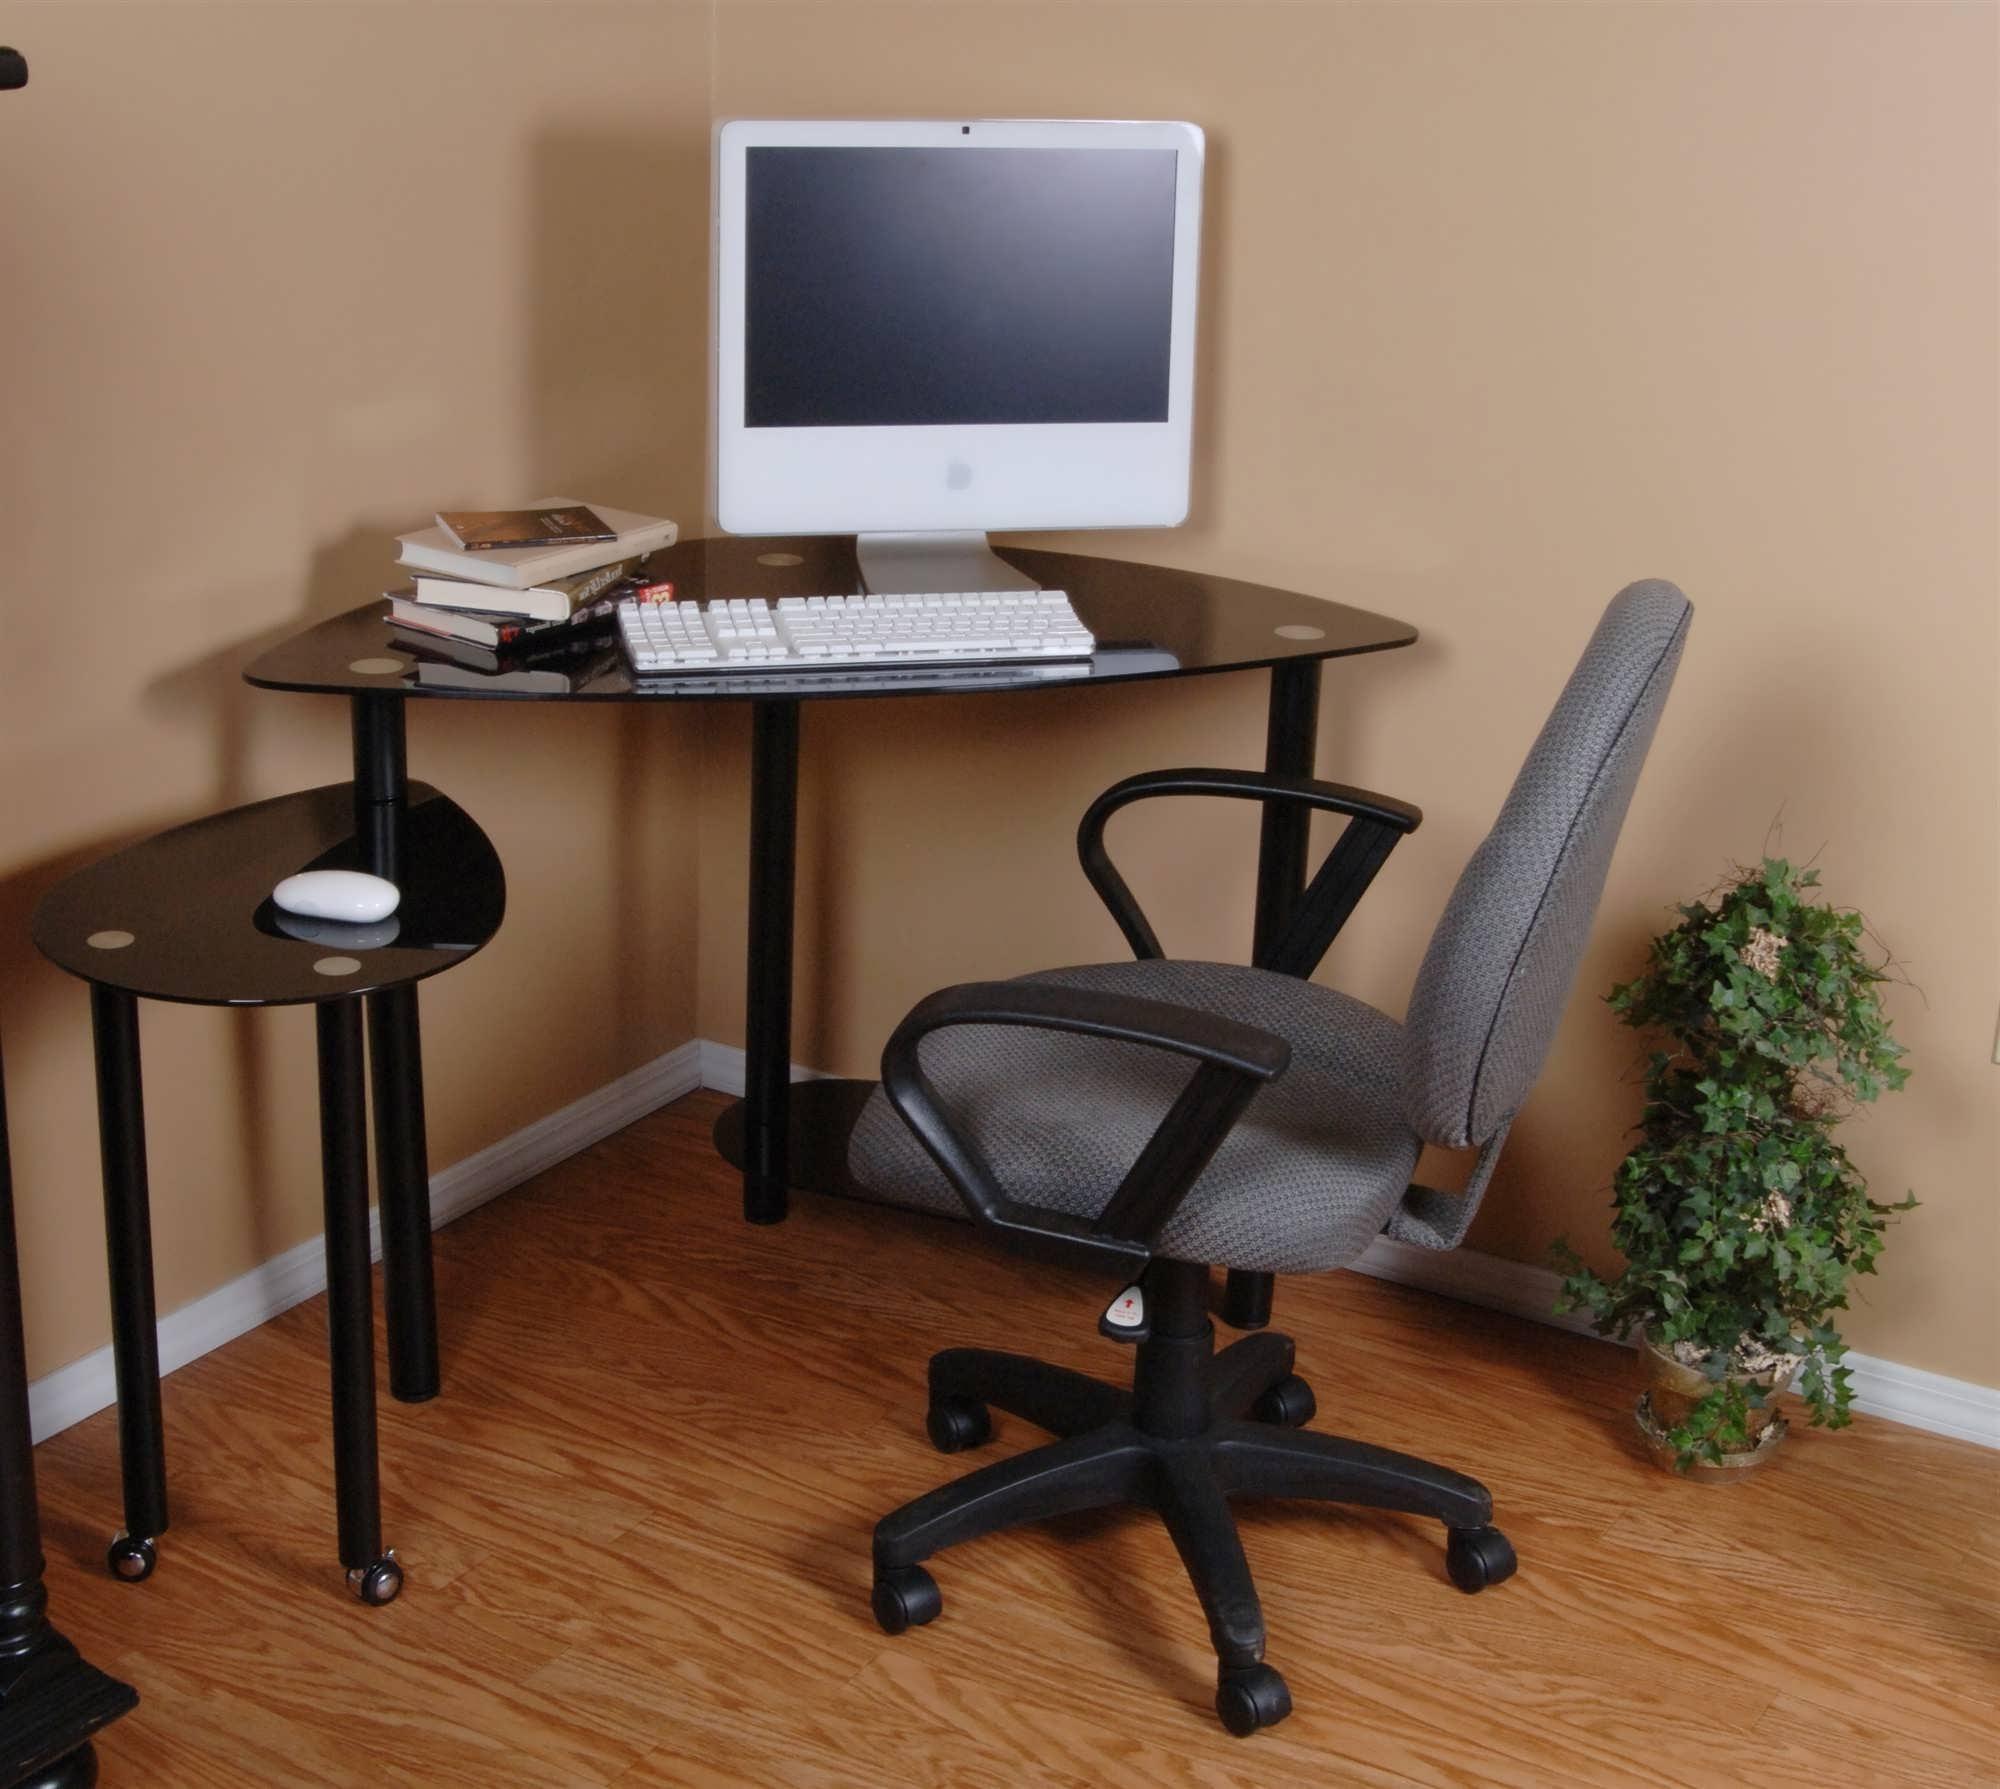 Latest Office Desk : L Shaped Computer Desk Unique Computer Desks Unique Regarding Quirky Computer Desks (View 9 of 20)